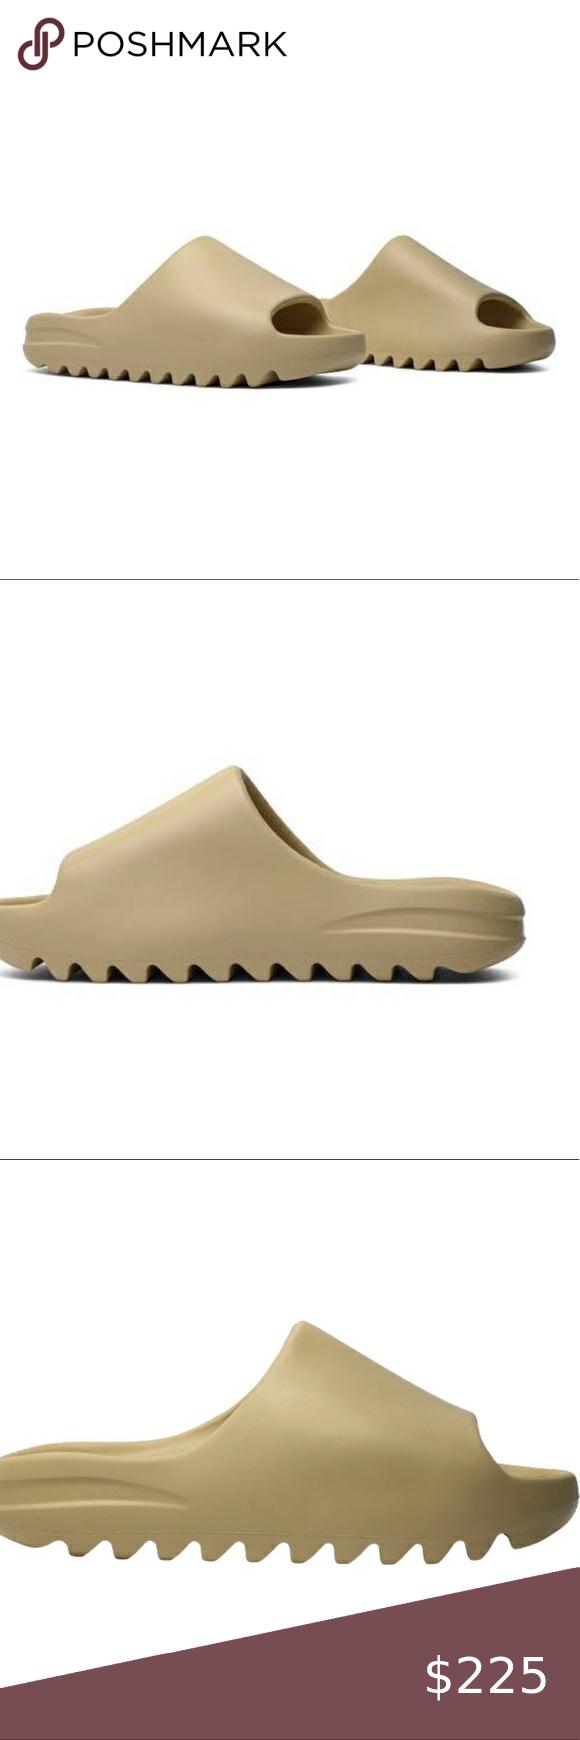 New Yeezy X Adidas Slides Desert Sand Size 9m In 2020 Yeezy Shoes Adidas Slides Mens Yeezy